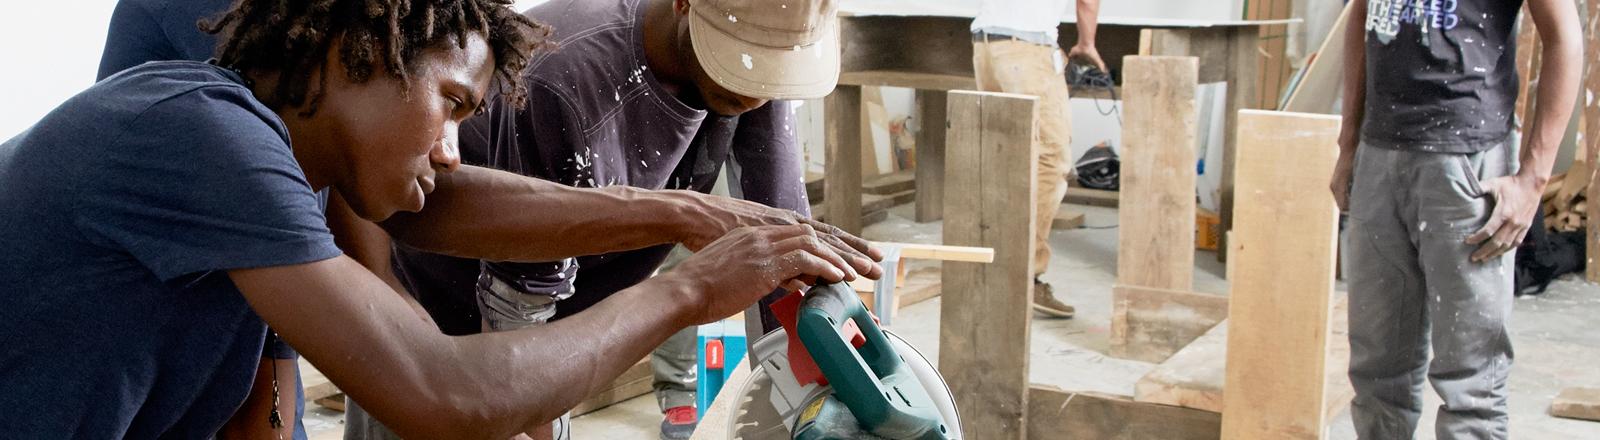 Cucula: Flüchtlinge bauen Möbel